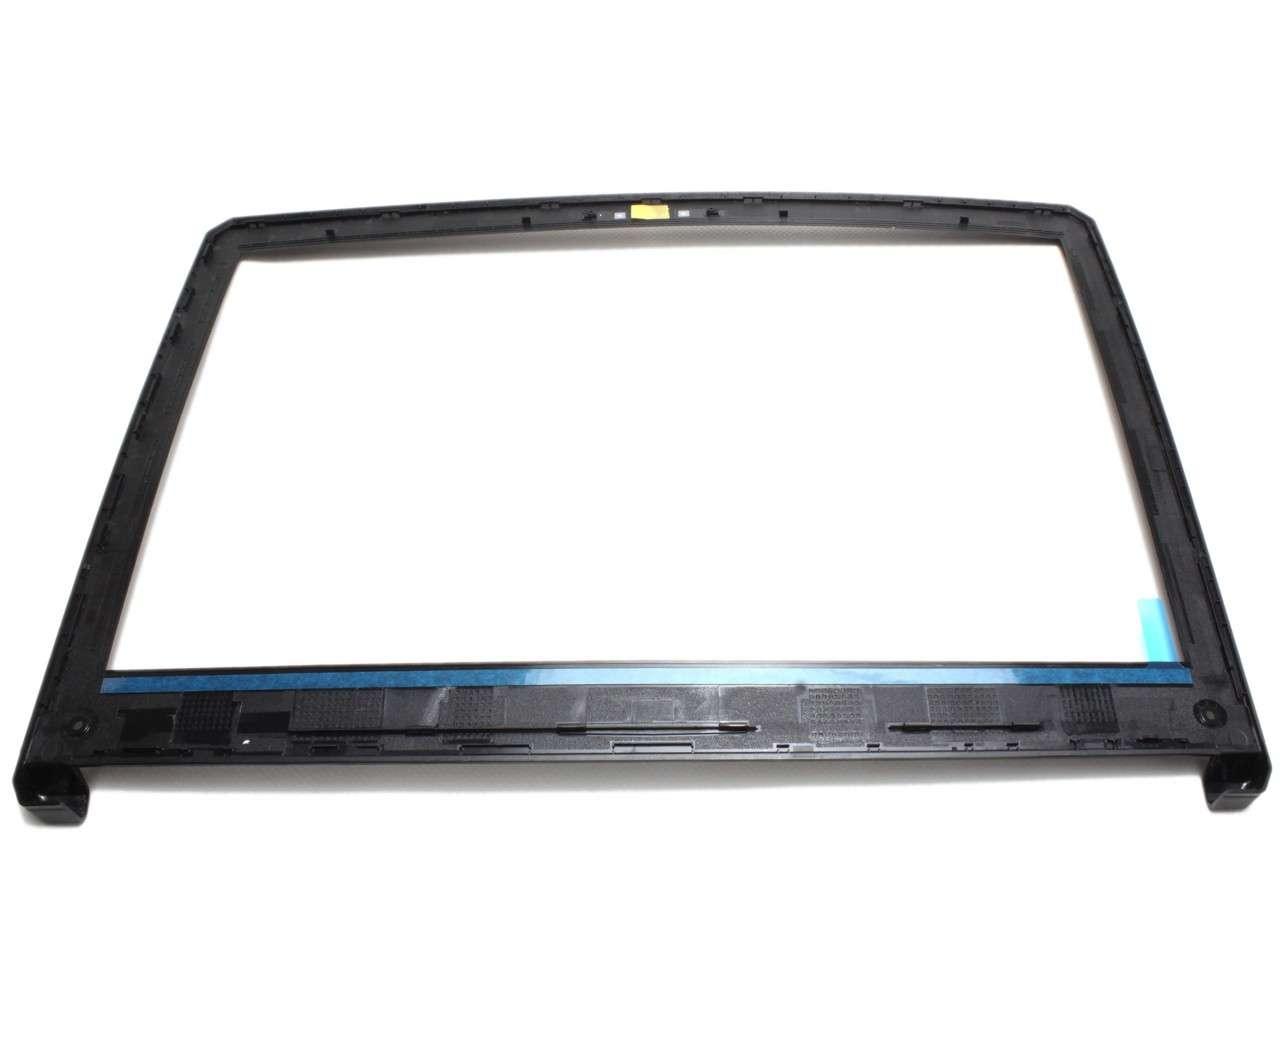 Rama Display Asus FX504GM Bezel Front Cover Neagra imagine powerlaptop.ro 2021